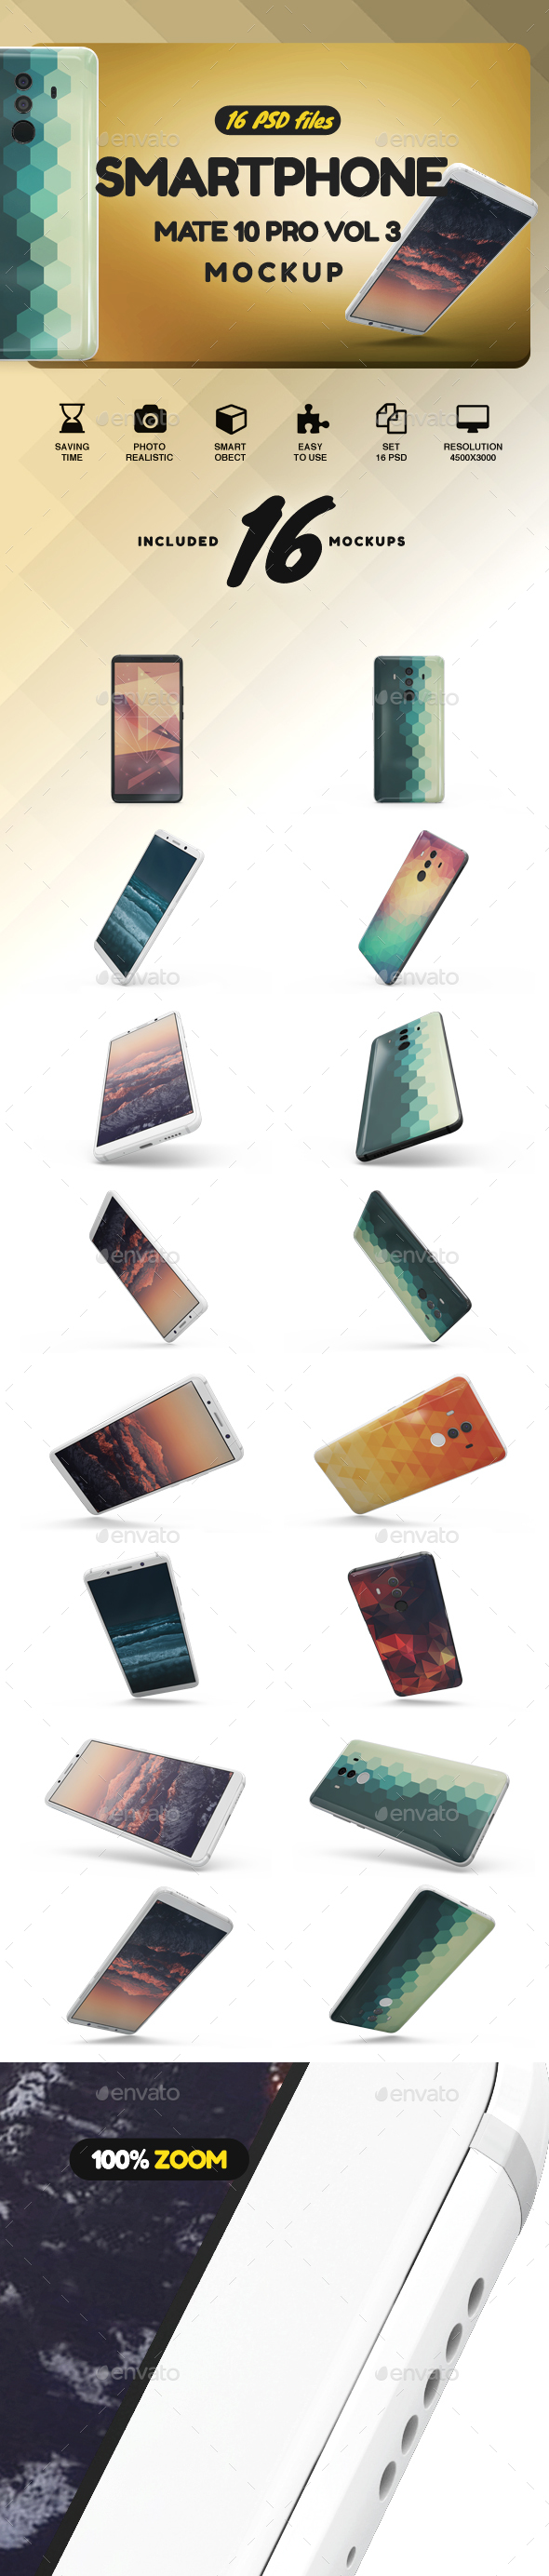 SmartPhone Mate 10 Pro vol3 App Mockup - Mobile Displays